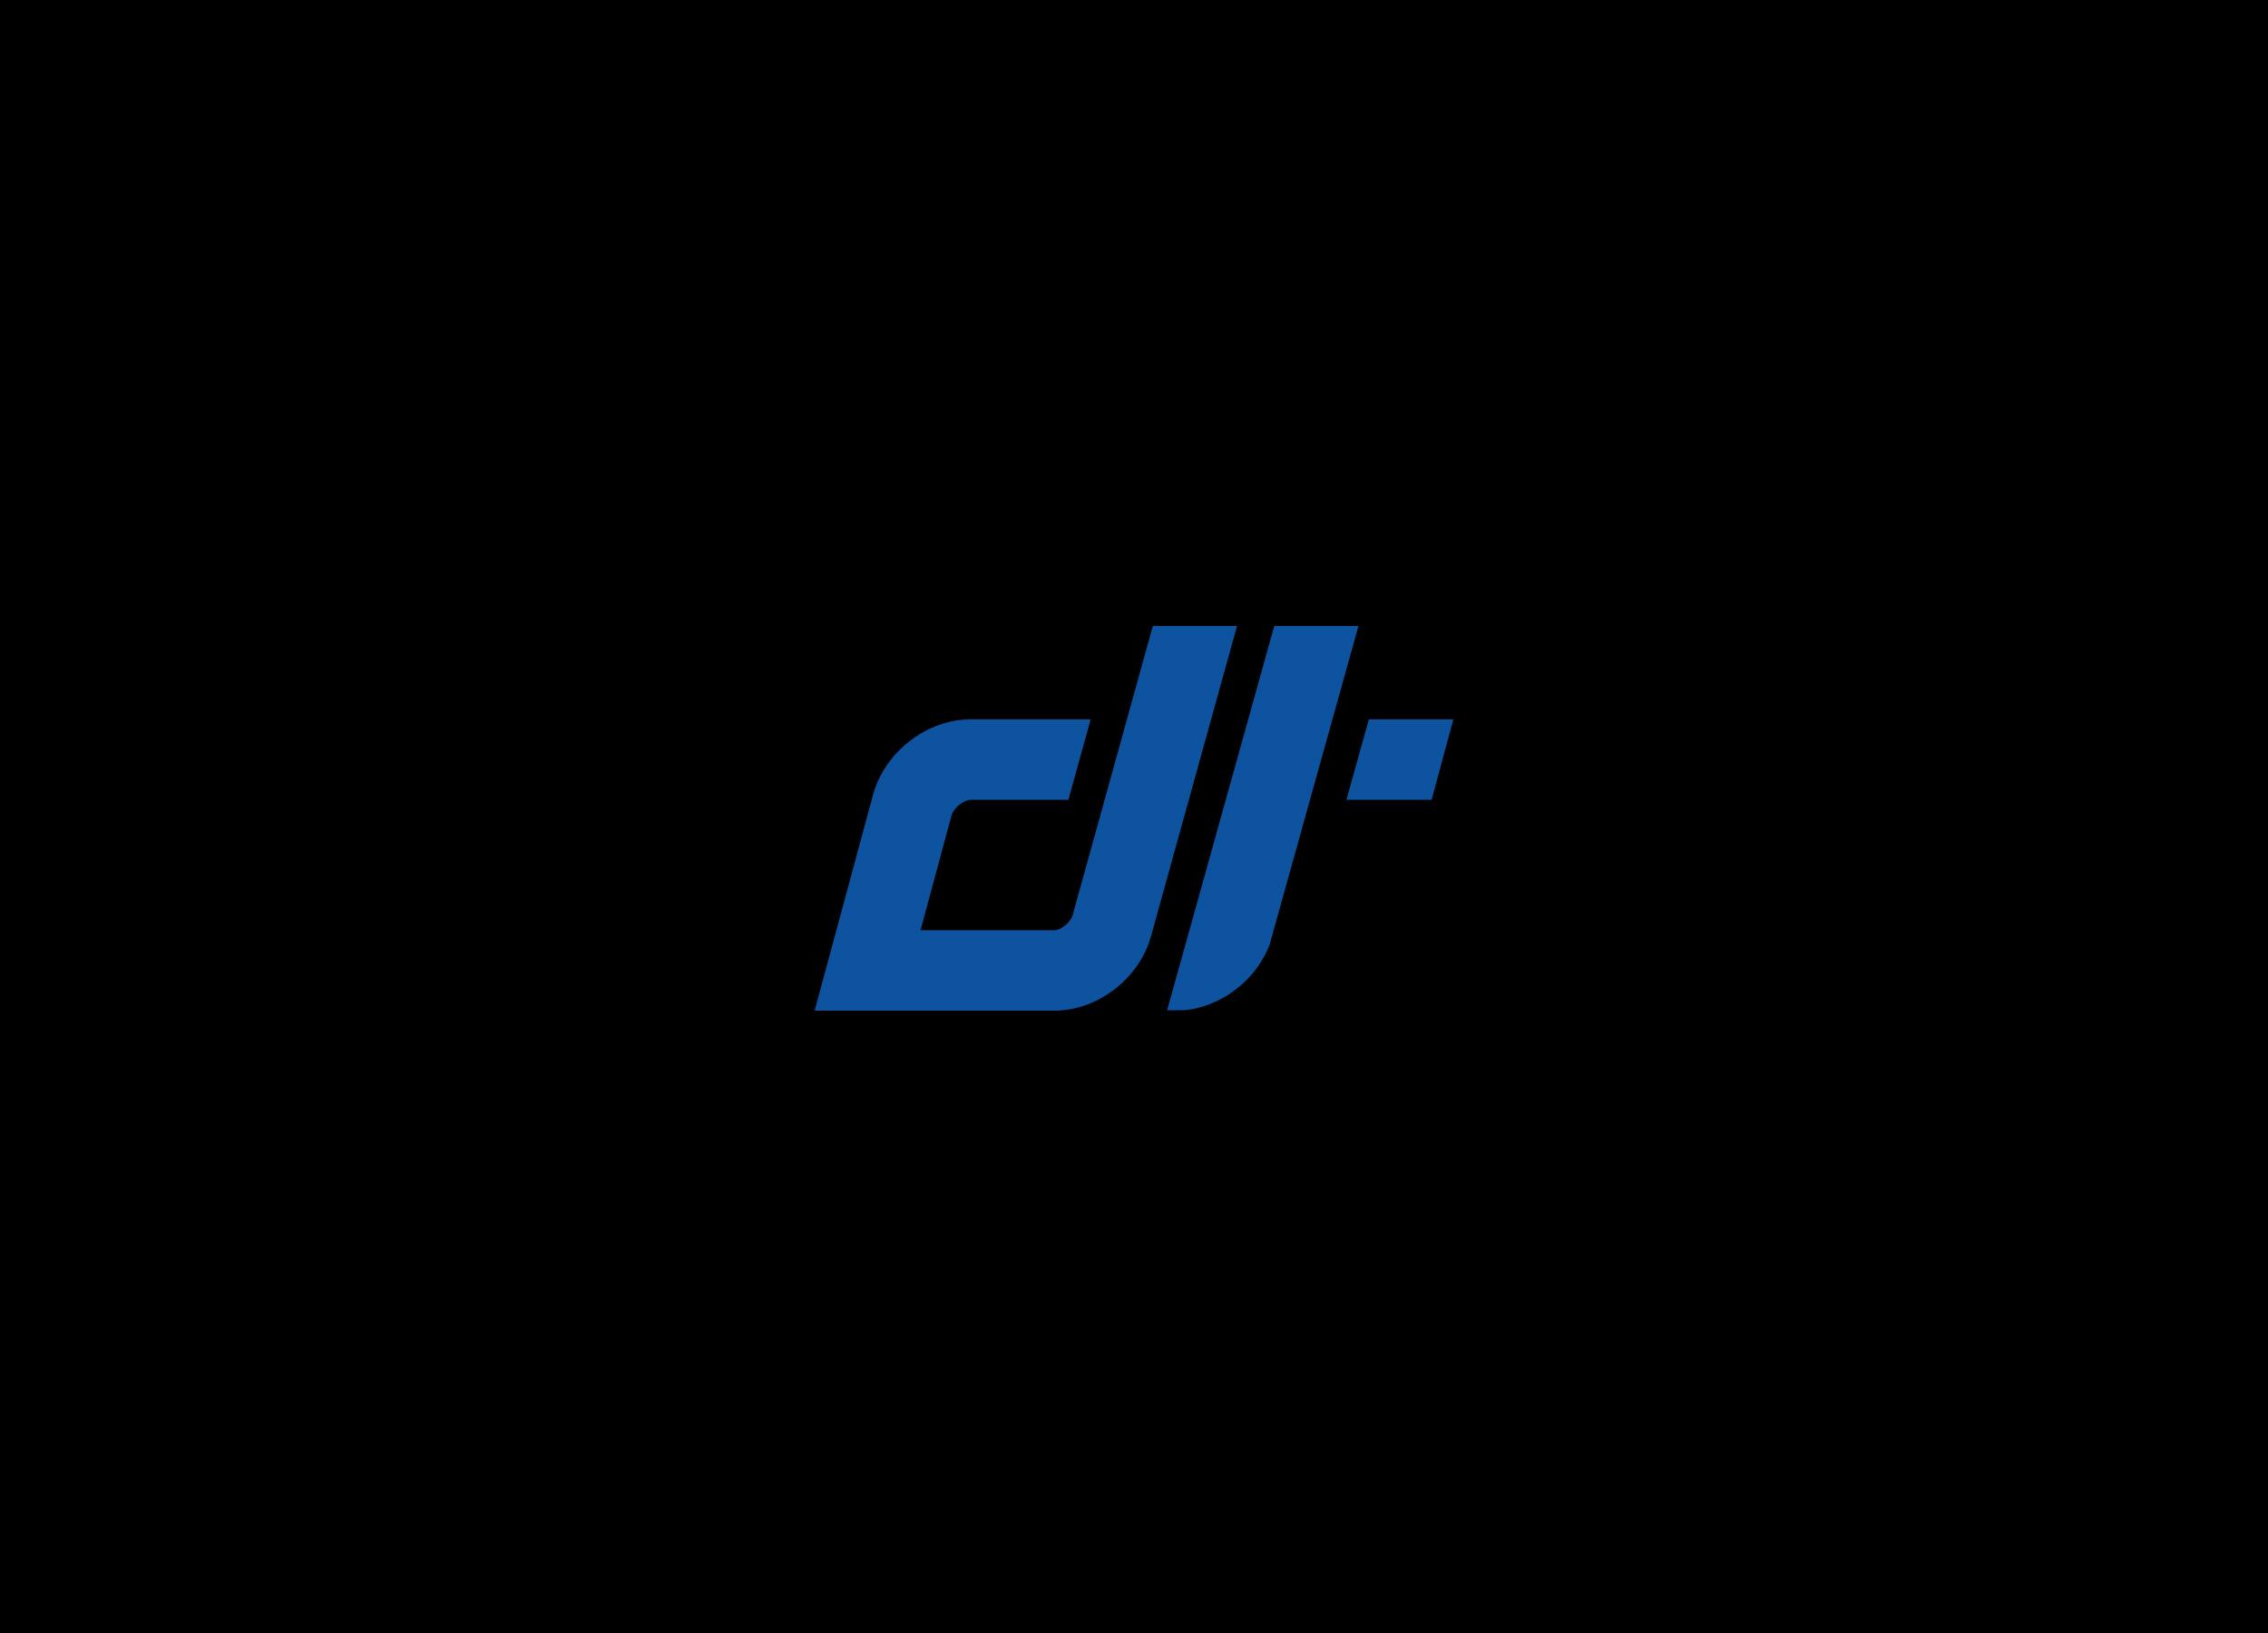 DT_logo_blk_2500x1800.jpg